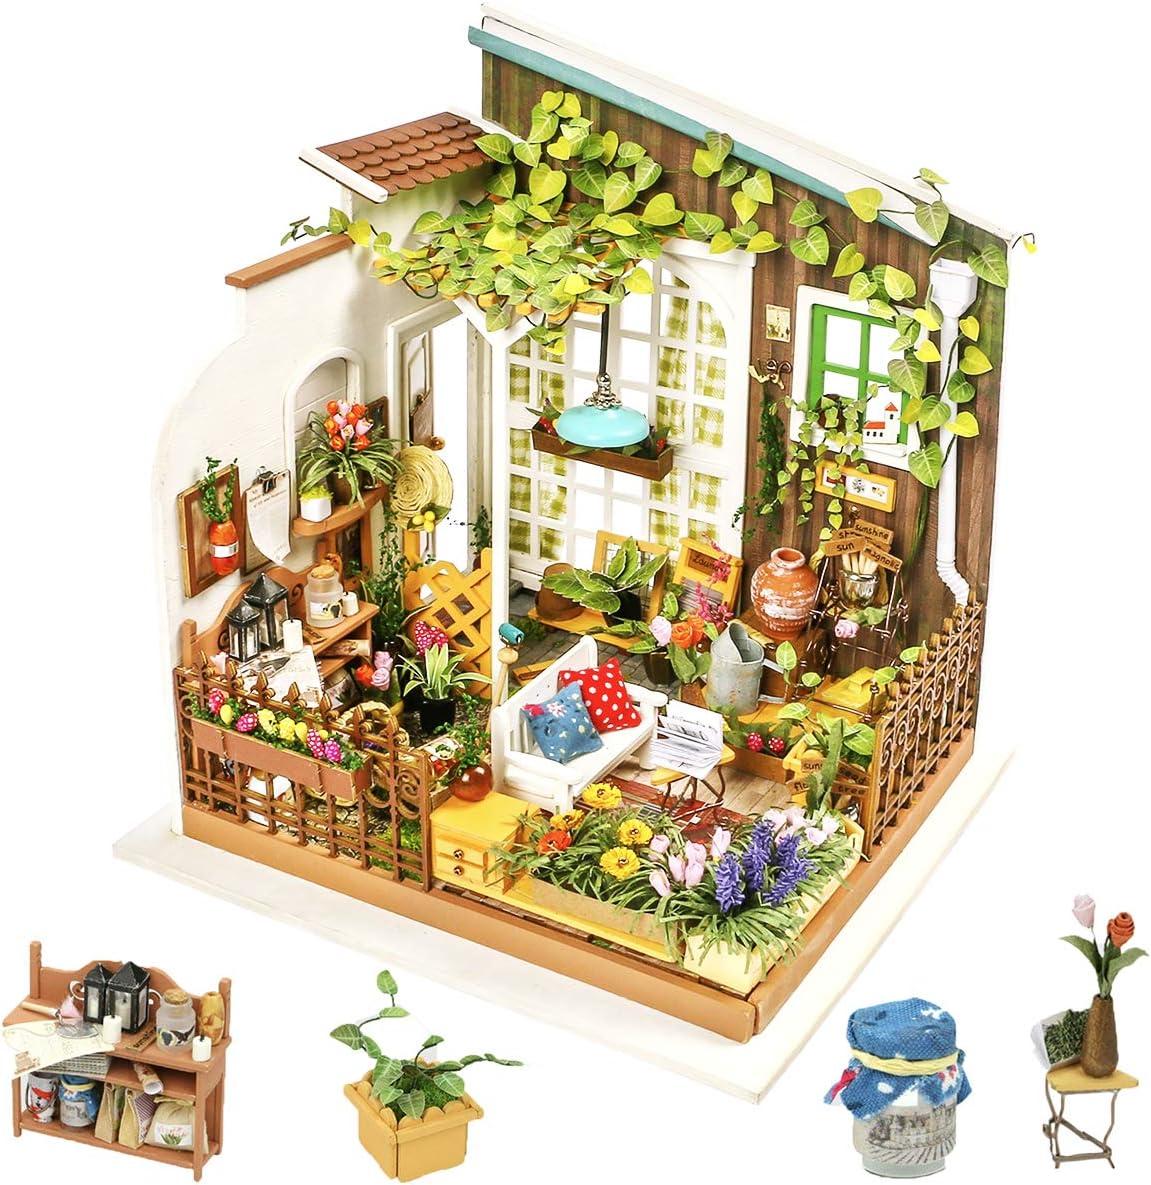 Rolife DIY Miniature Dollhouse Kit, 1:24 Scale Wooden Gardon Mini House Furniture for Women and Girls, Gift for Birthday/Christmas/Valentine (Miller's Gardon)